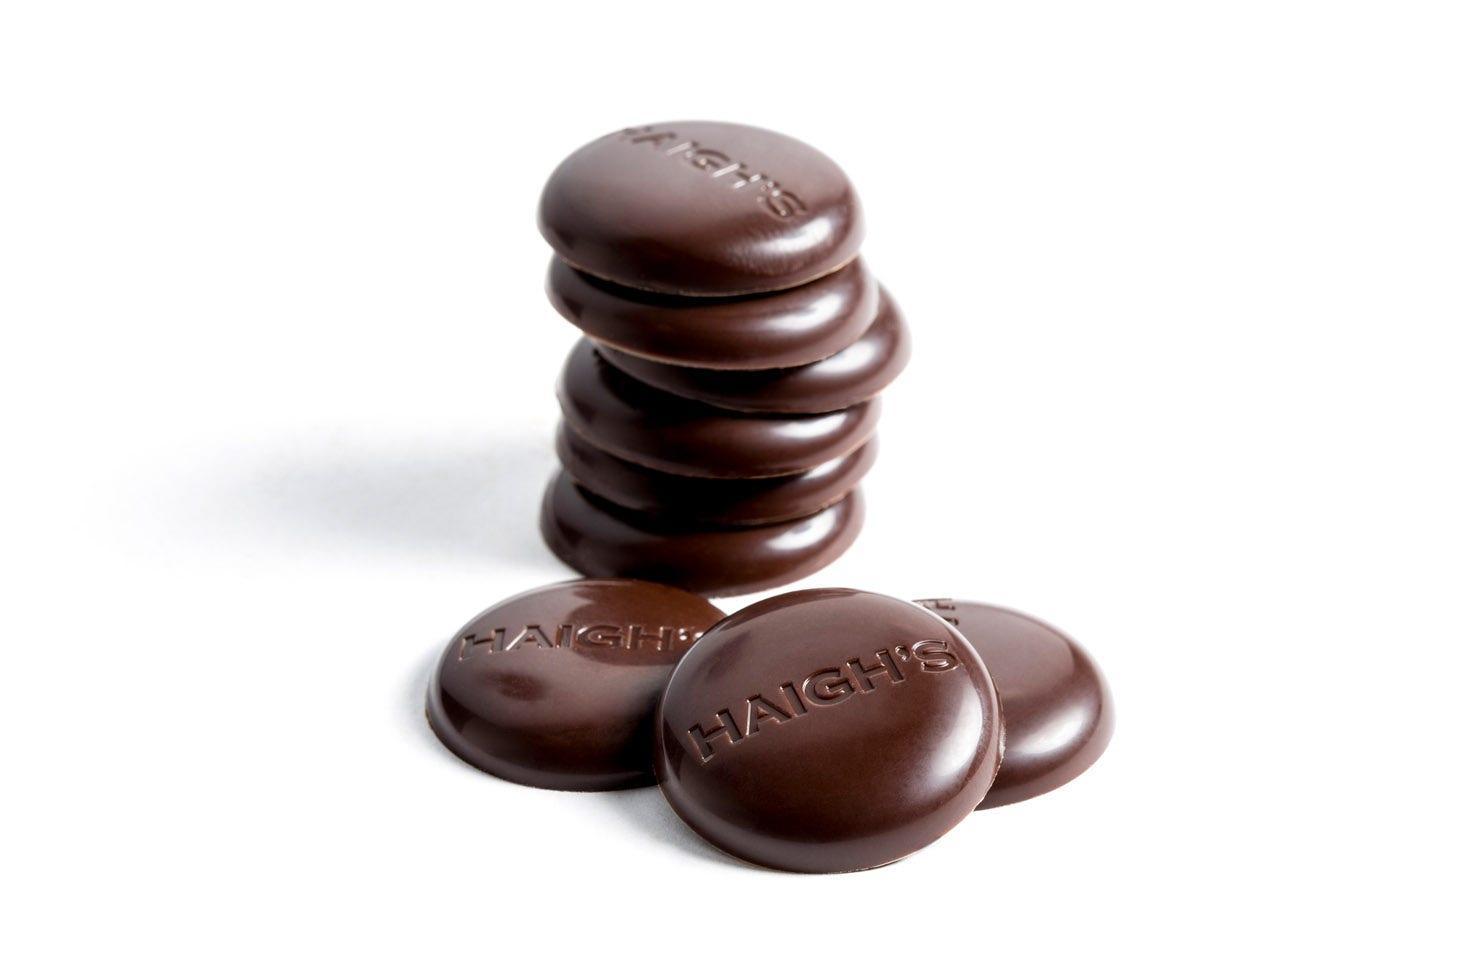 70% Dark Chocolate Pastilles